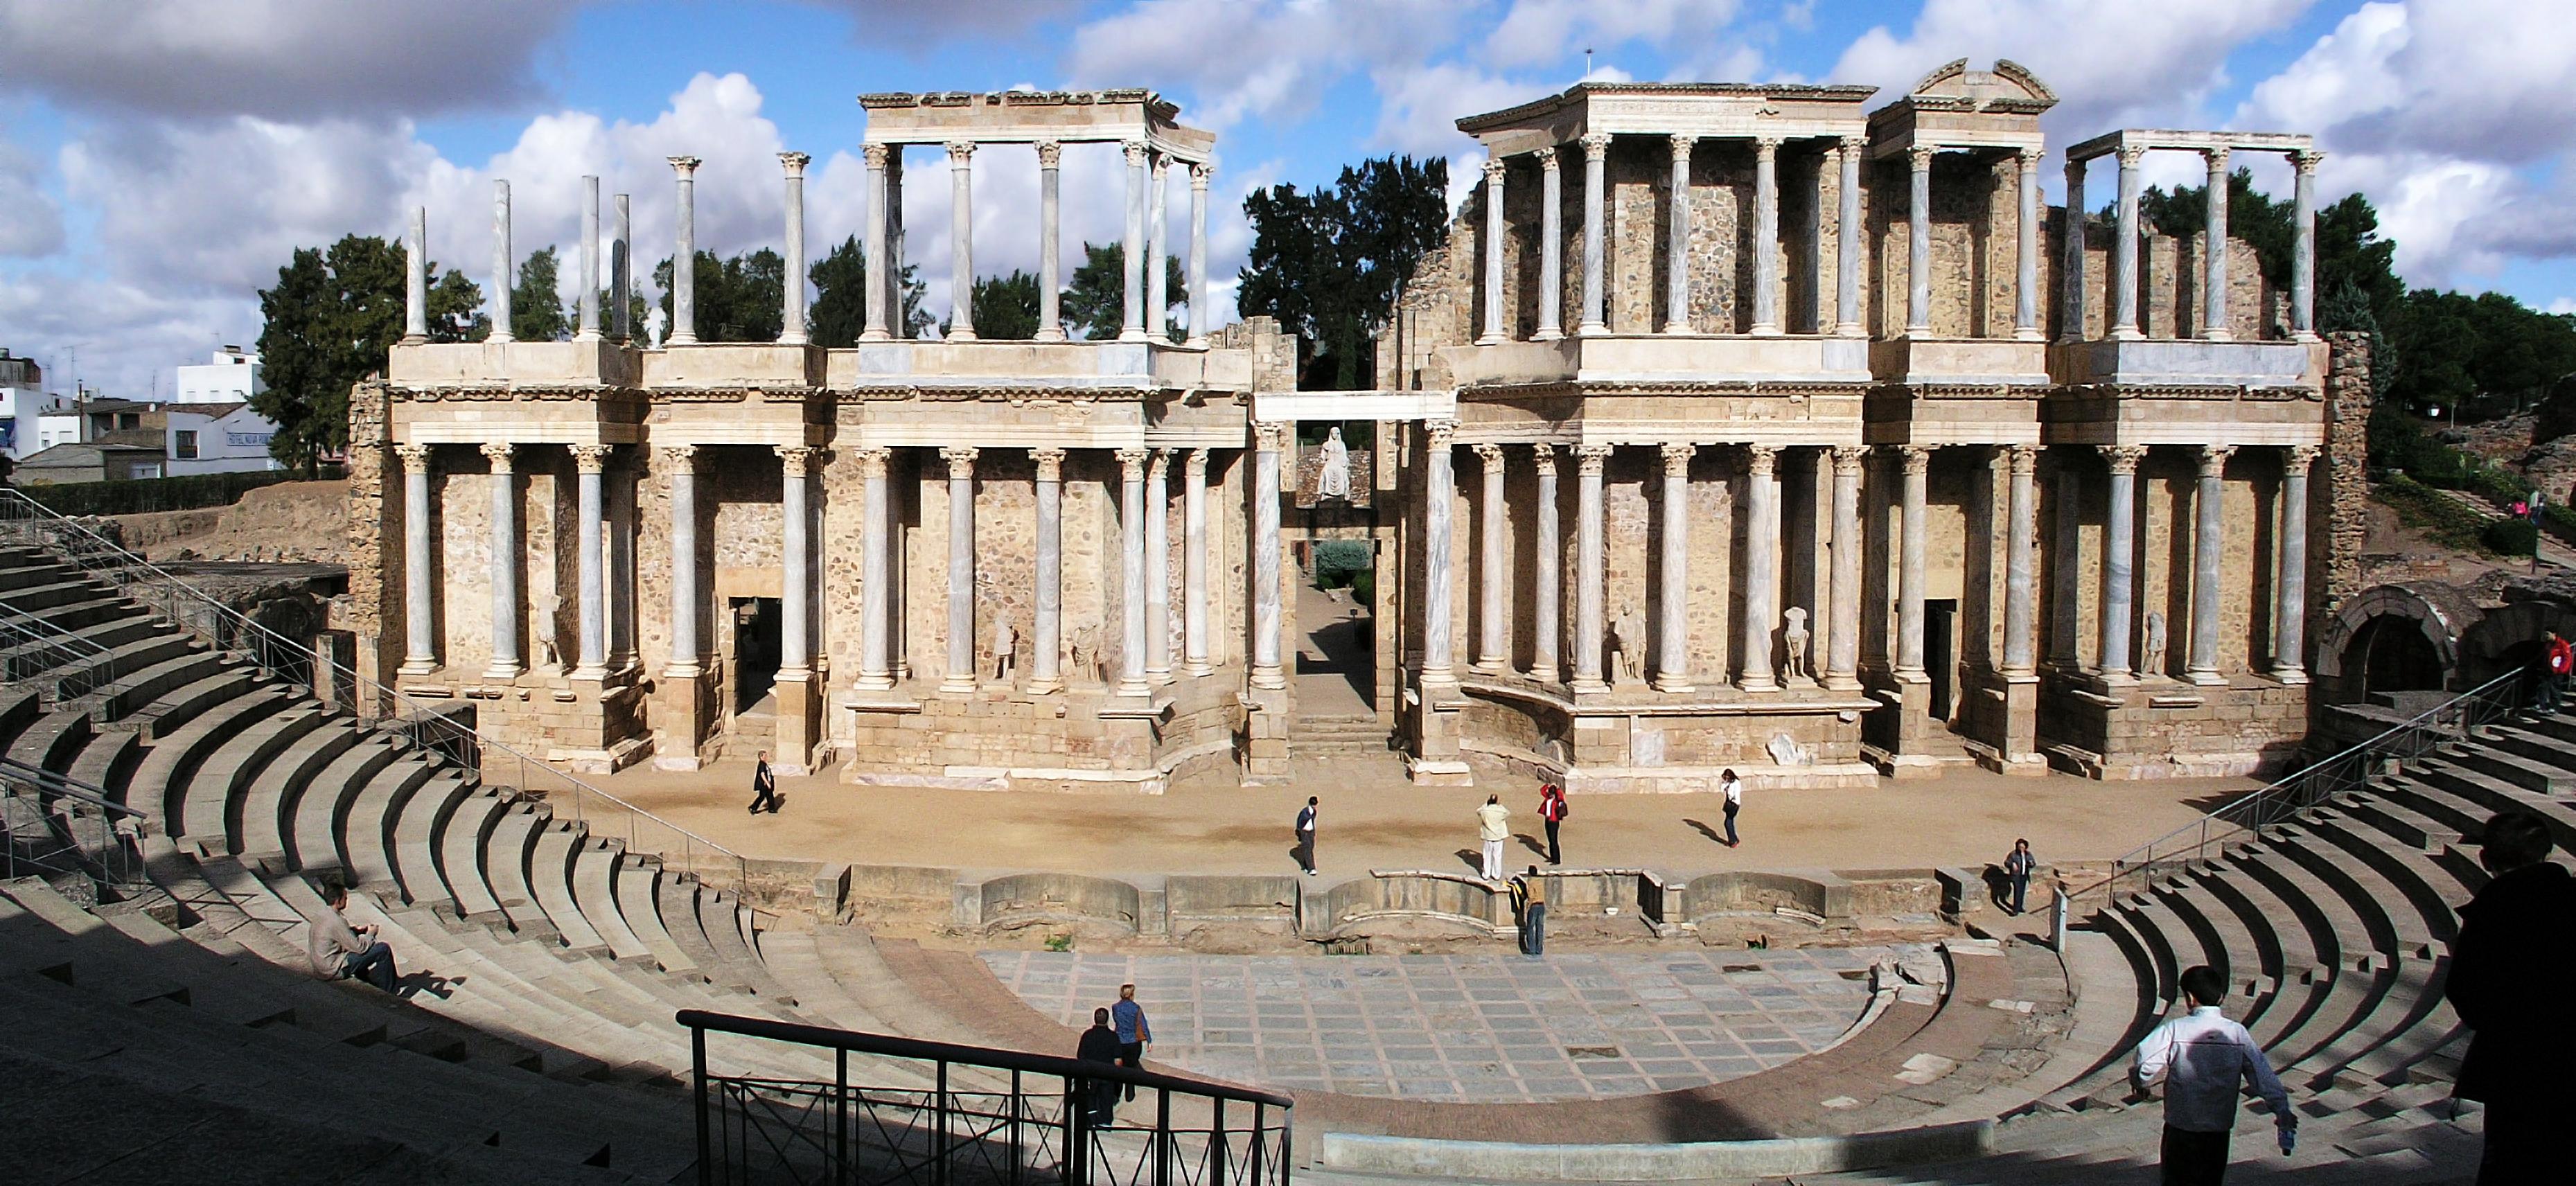 File:Merida Roman Theatre1.jpg - Wikipedia